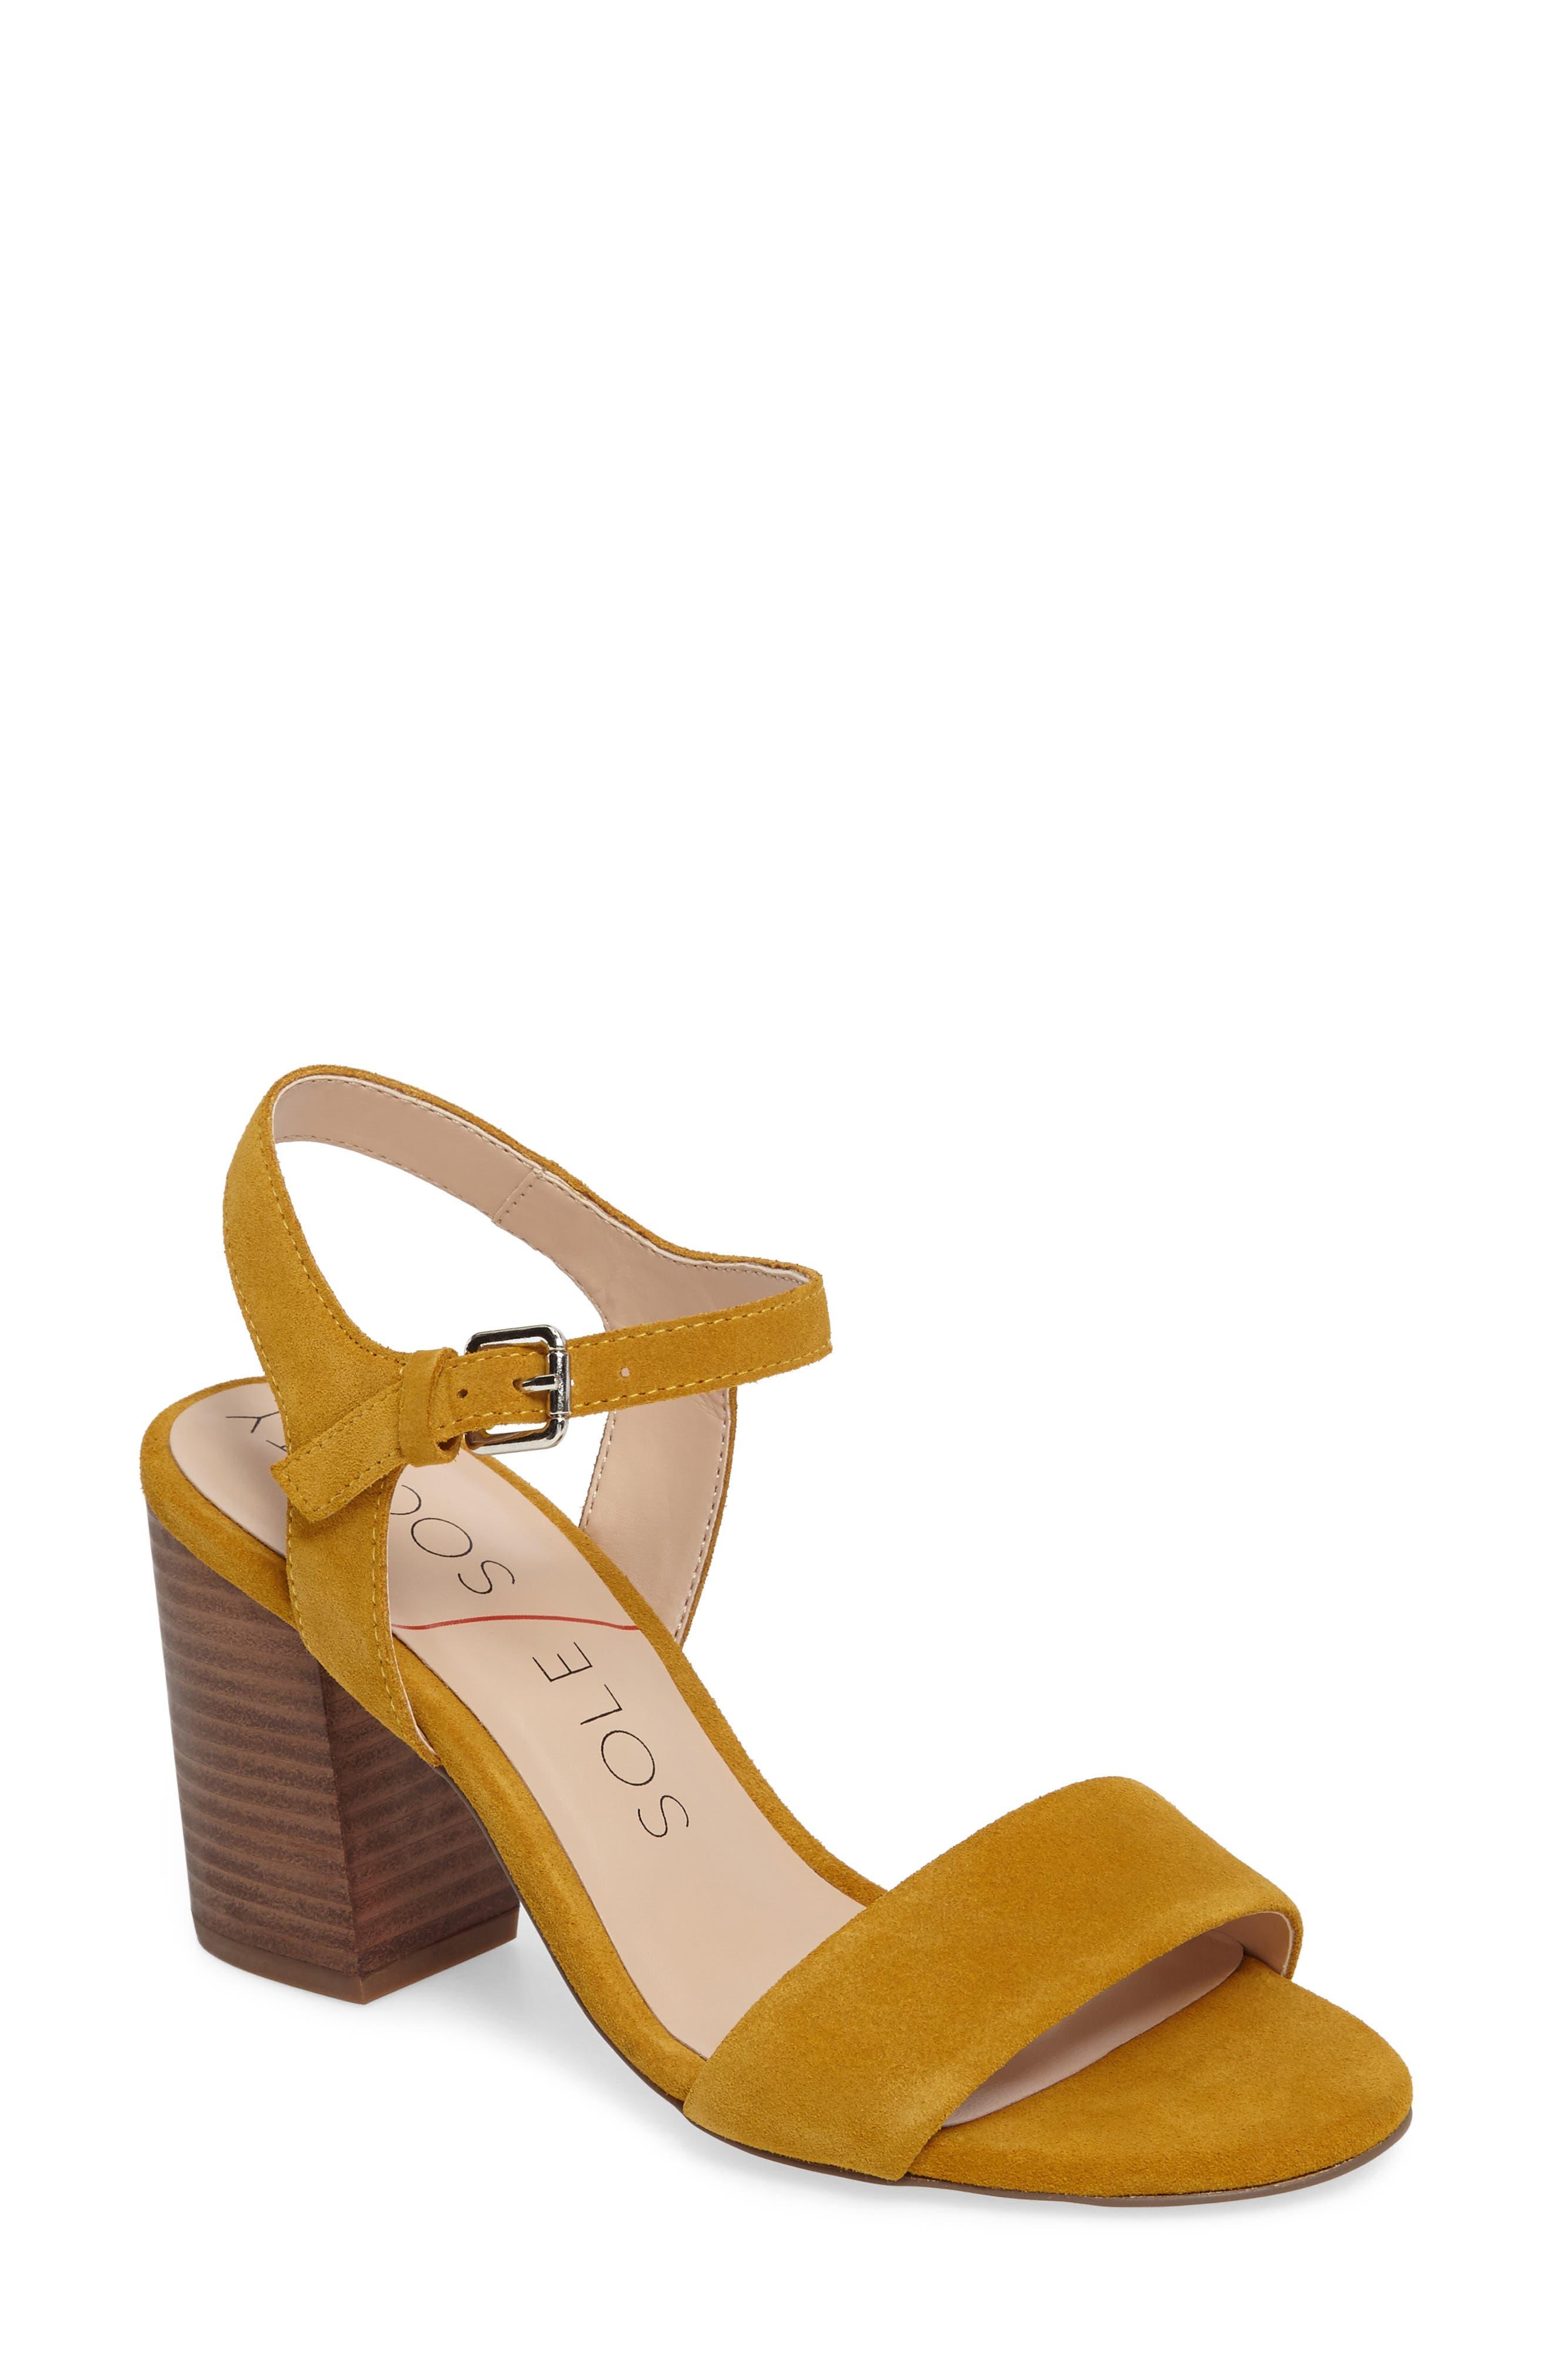 'Linny' Ankle Strap Sandal,                             Main thumbnail 5, color,